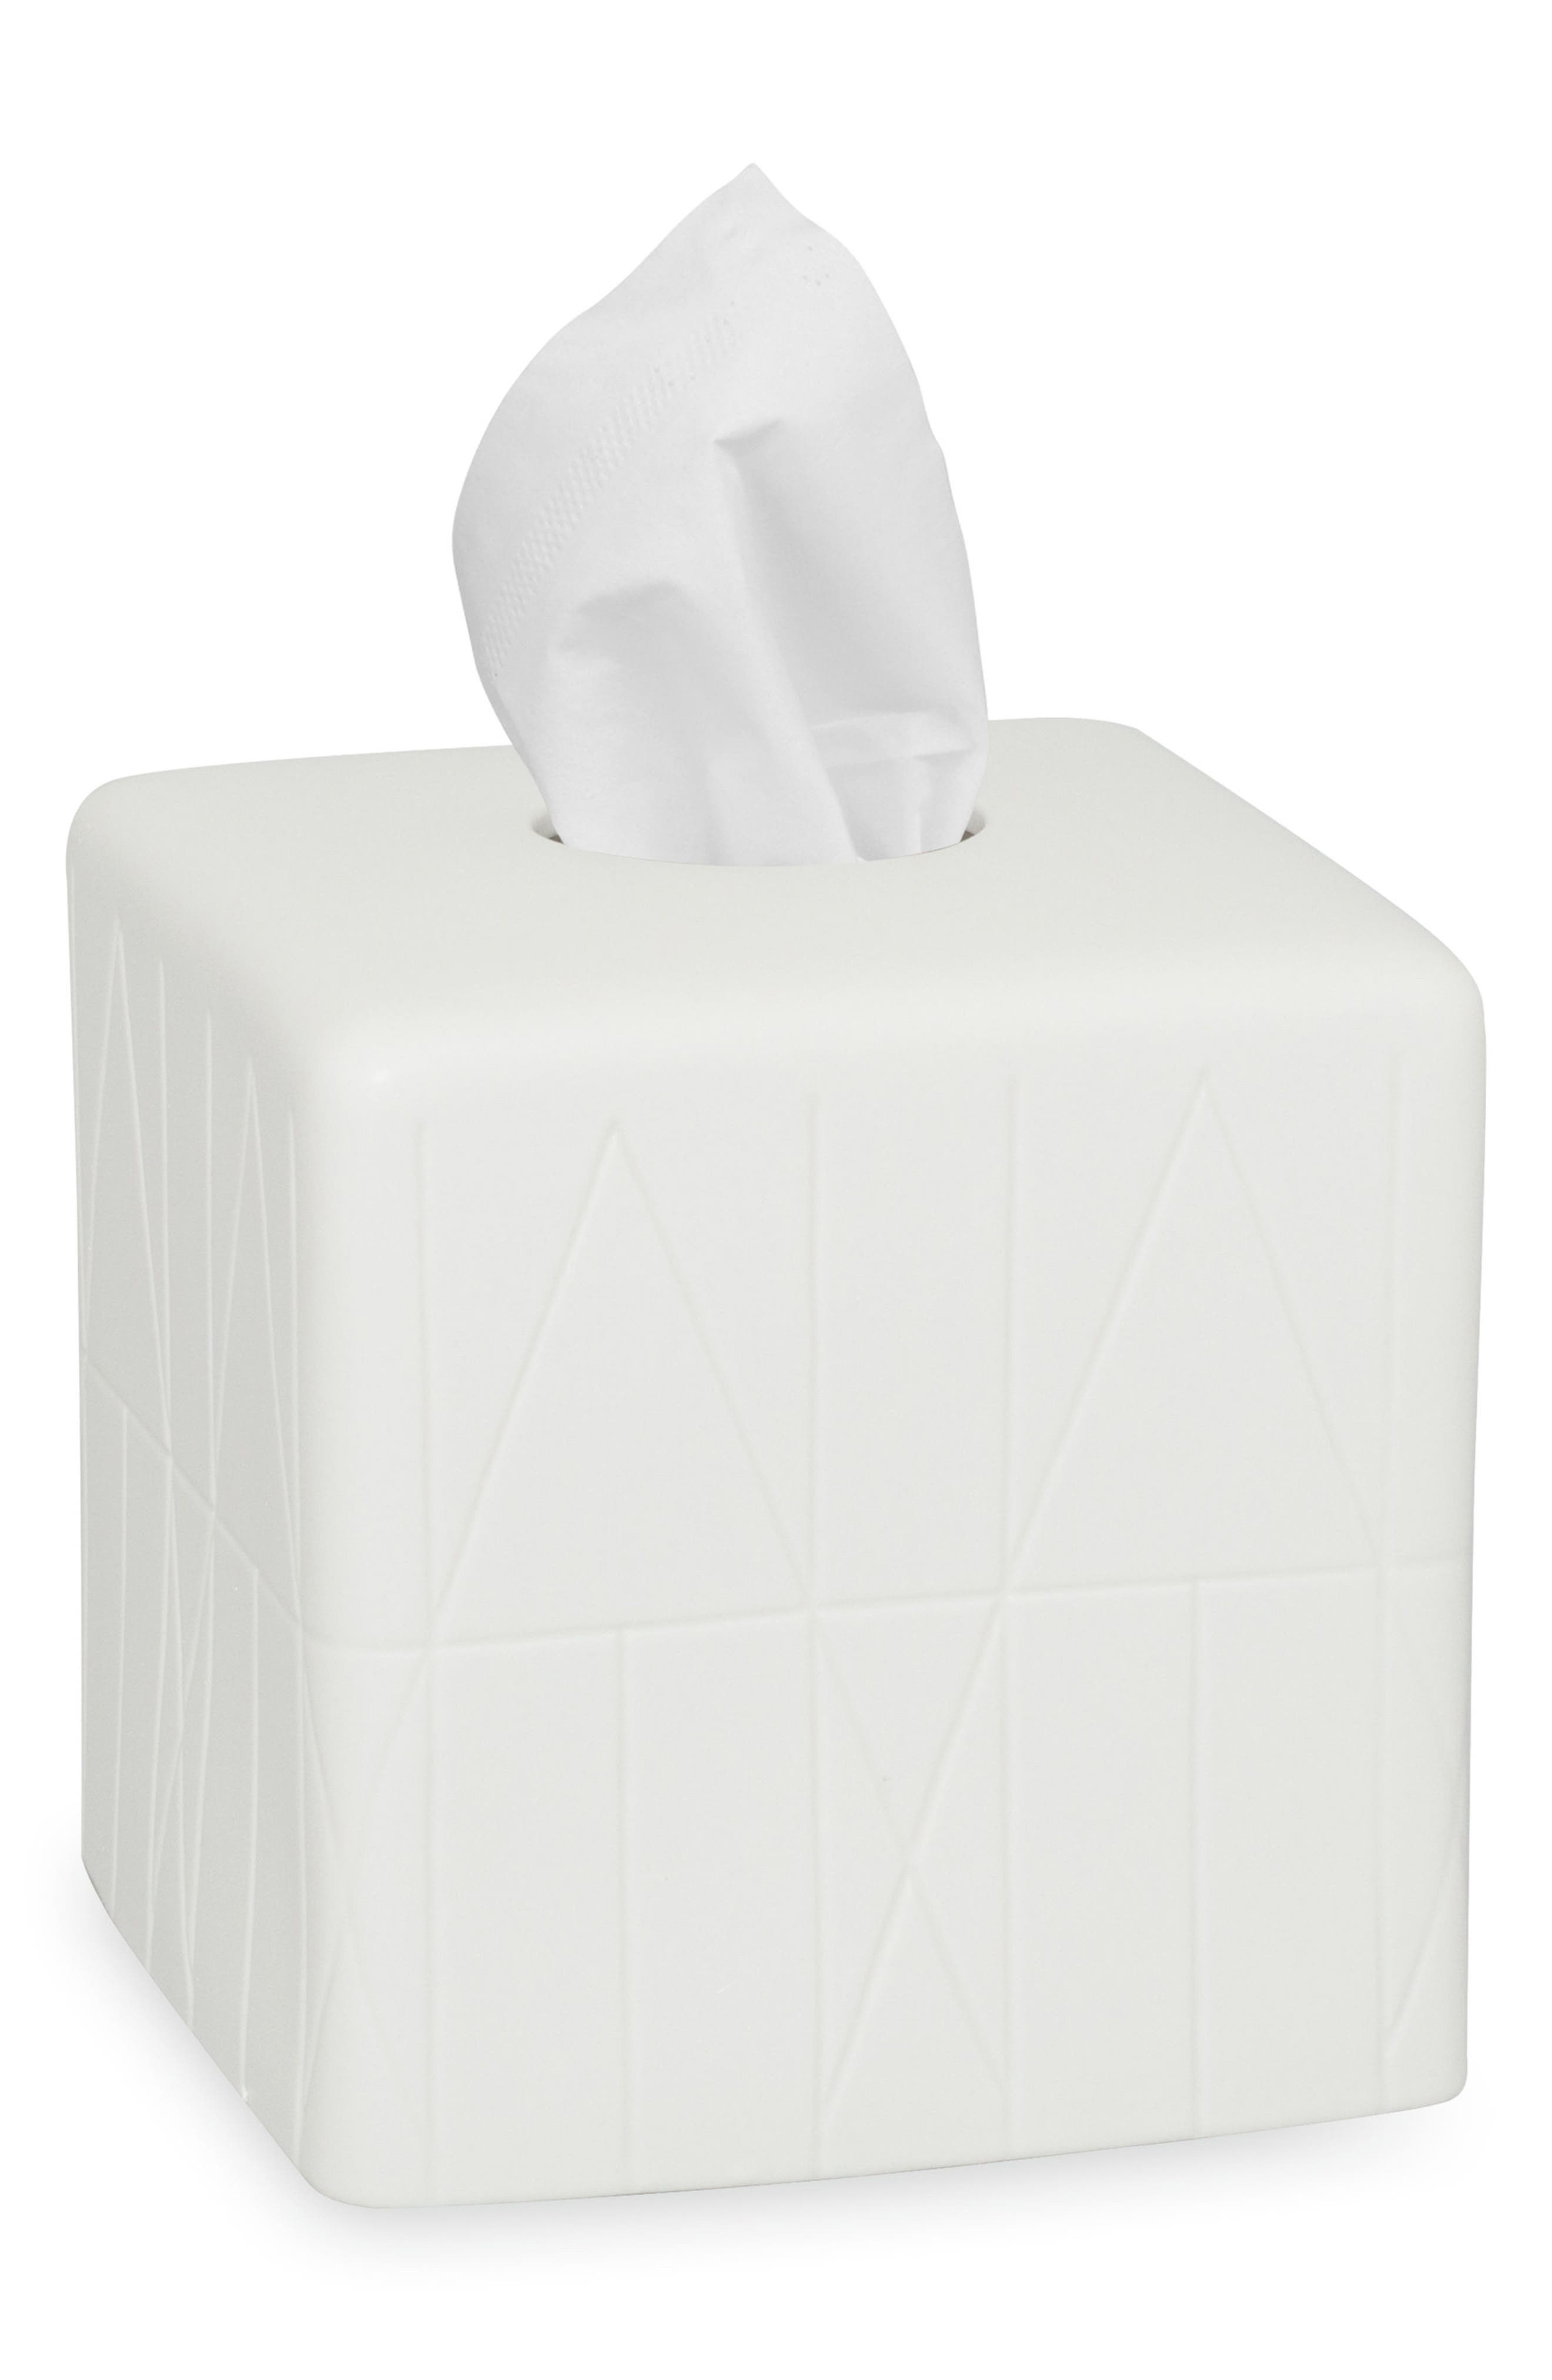 DKNY Geometrix Tissue Box Cover